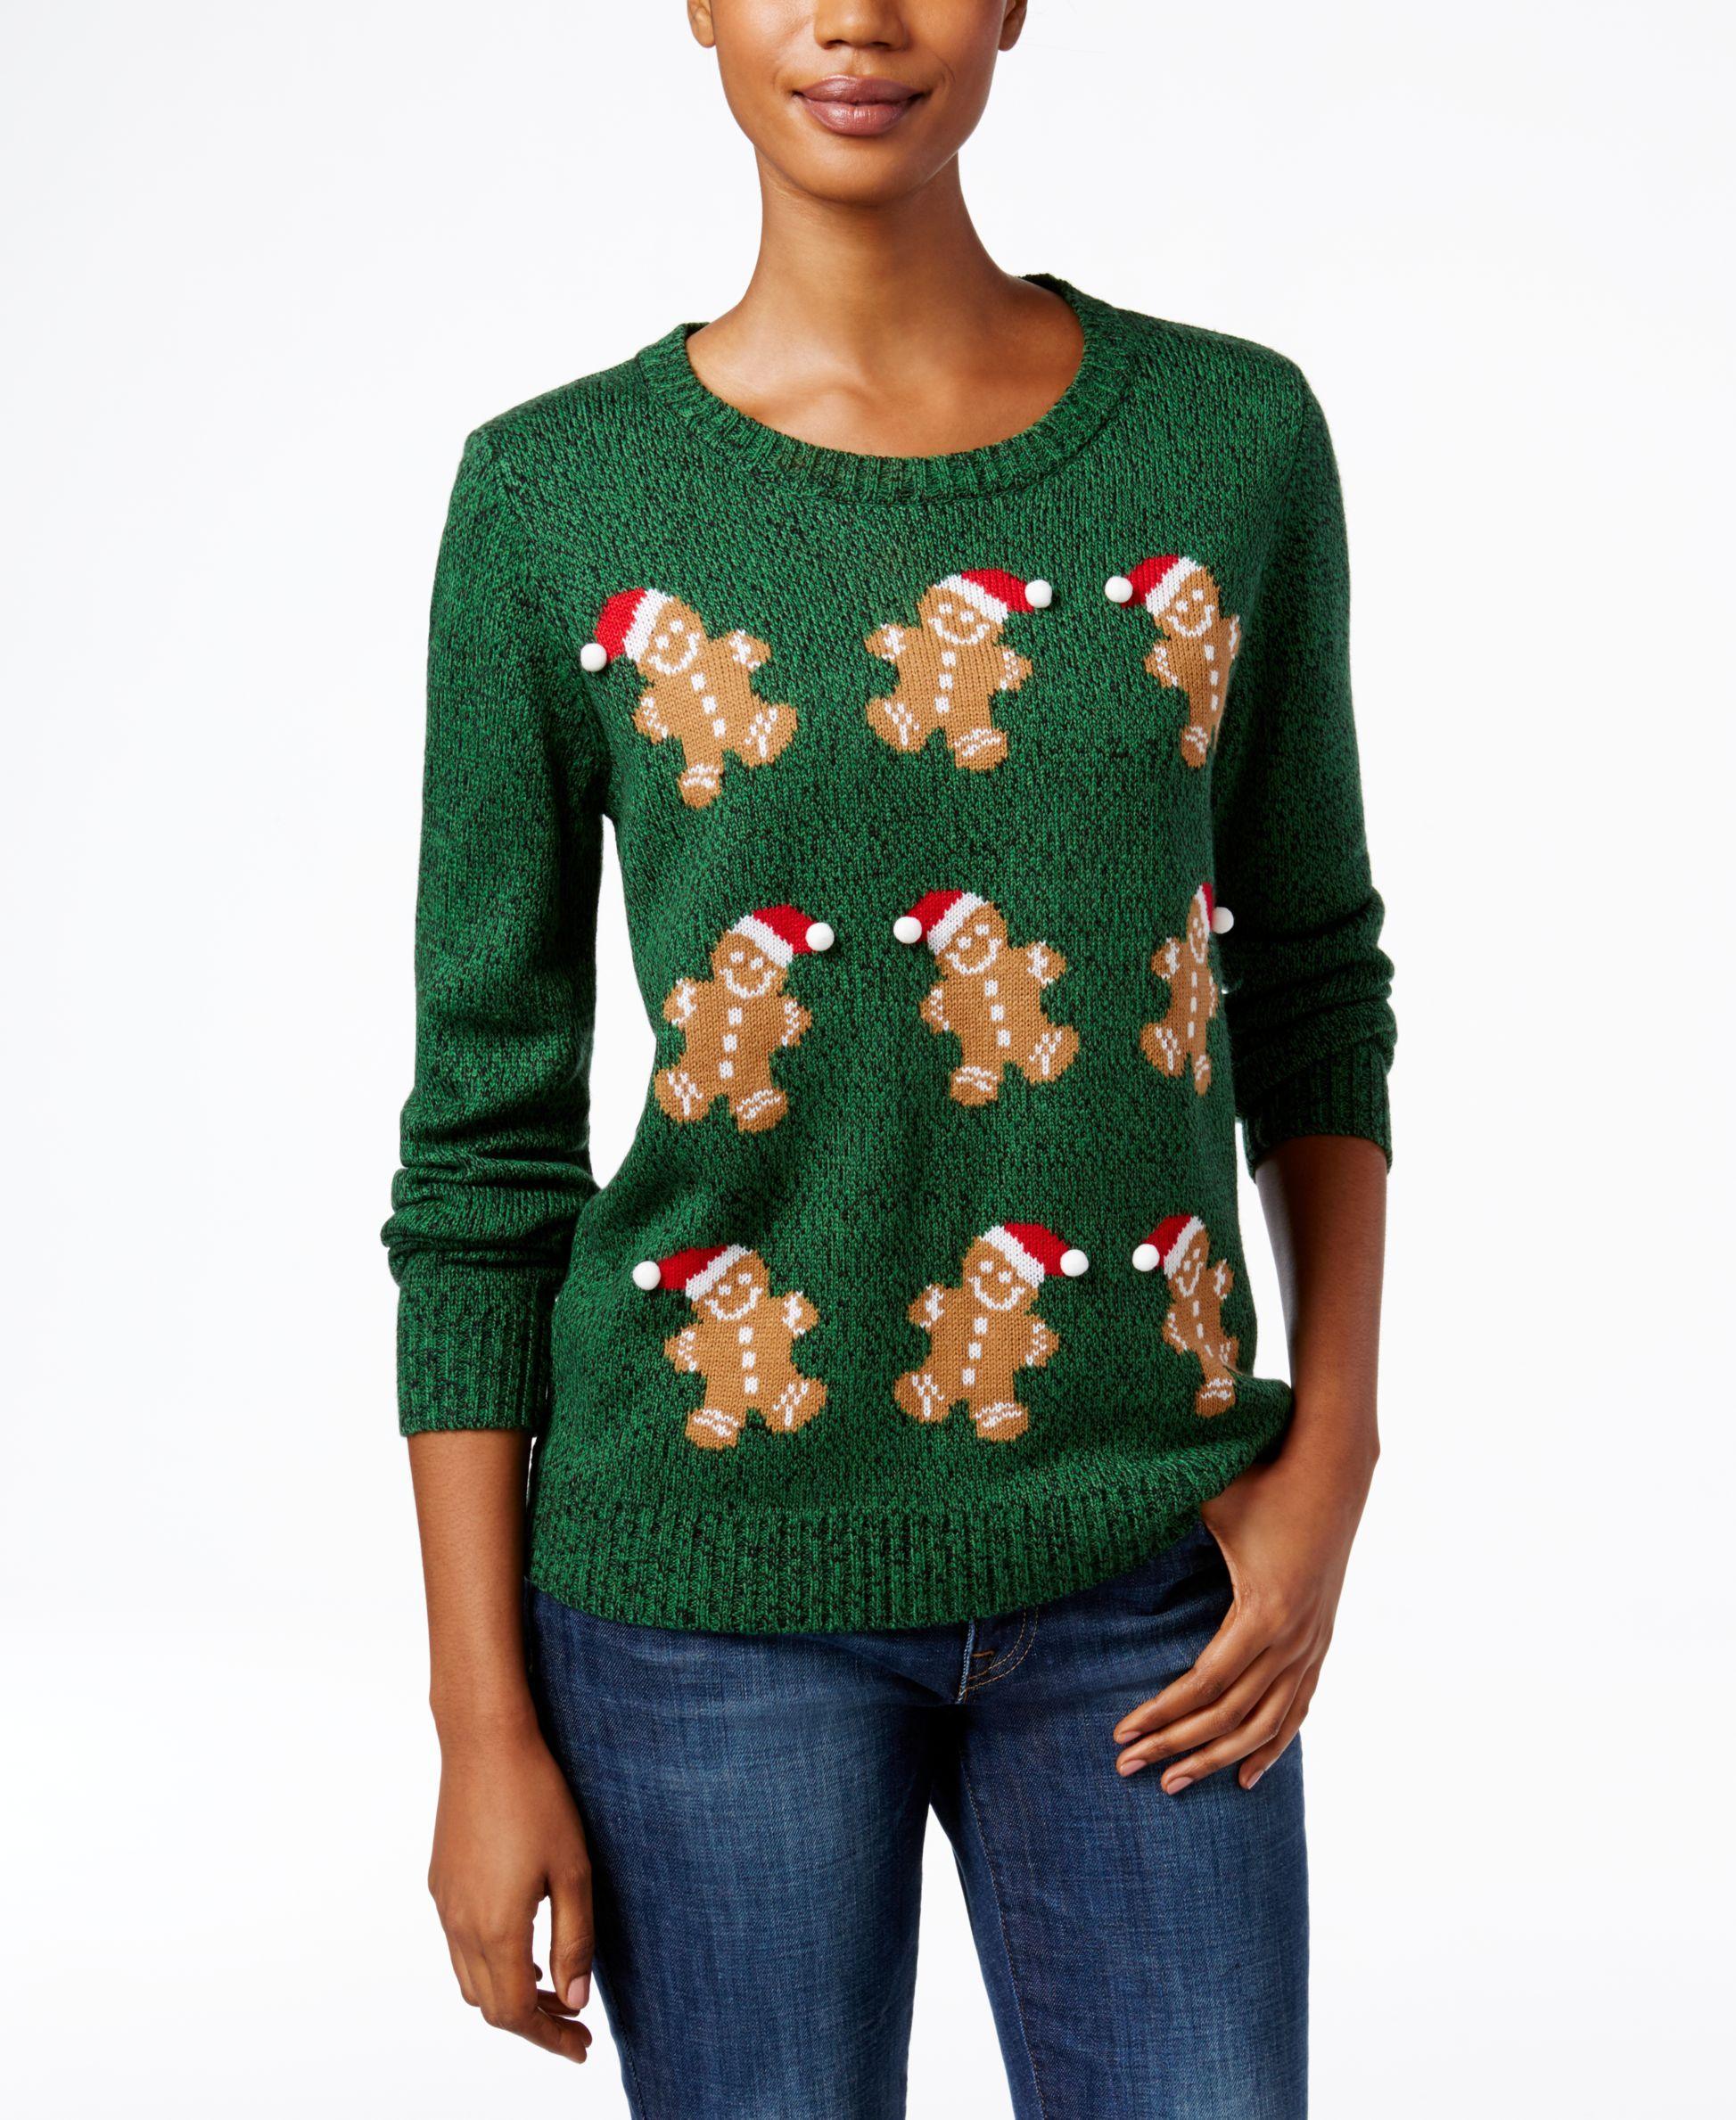 Macys Christmas Sweaters.Karen Scott Gingerbread Man Christmas Sweater Only At